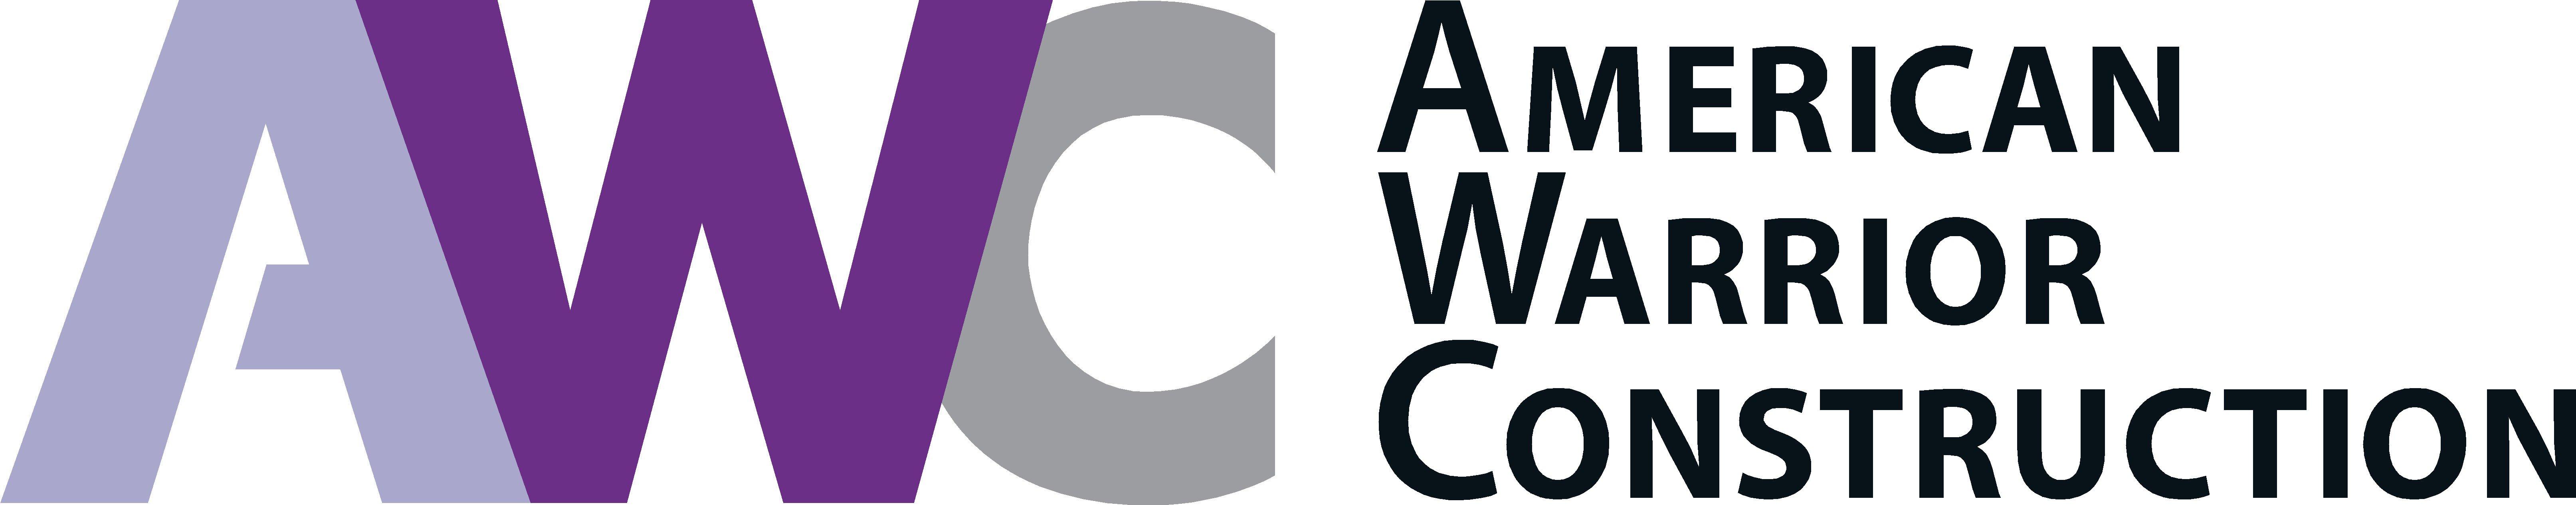 American Warrior Construction, Inc.